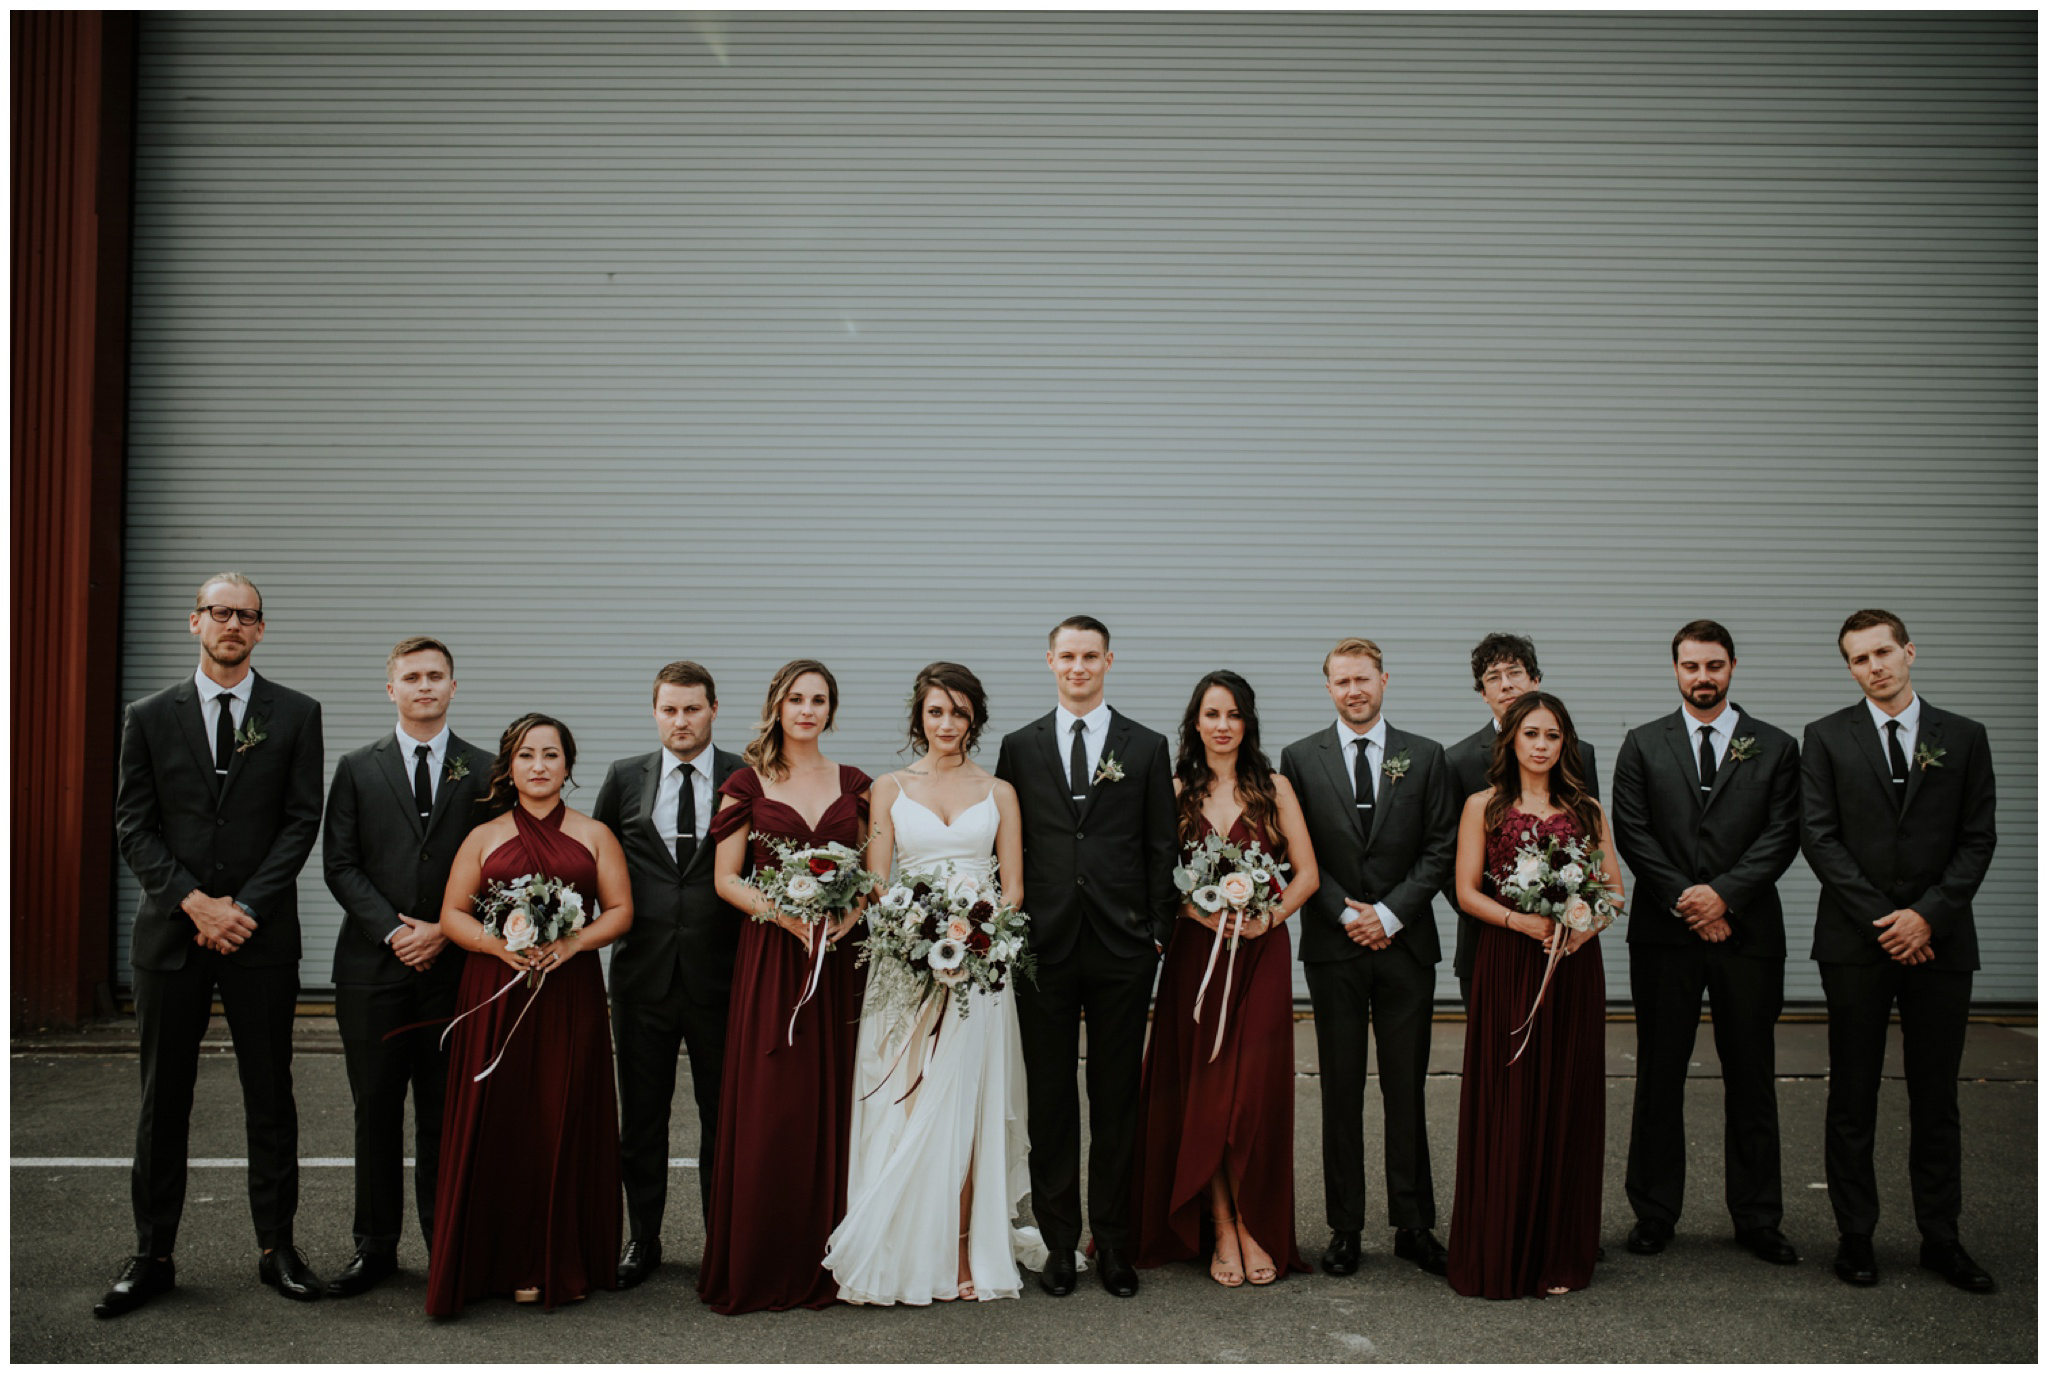 alyssa-keiran-westland-distillery-urban-seattle-wedding-photographer-caitlyn-nikula-82.jpg